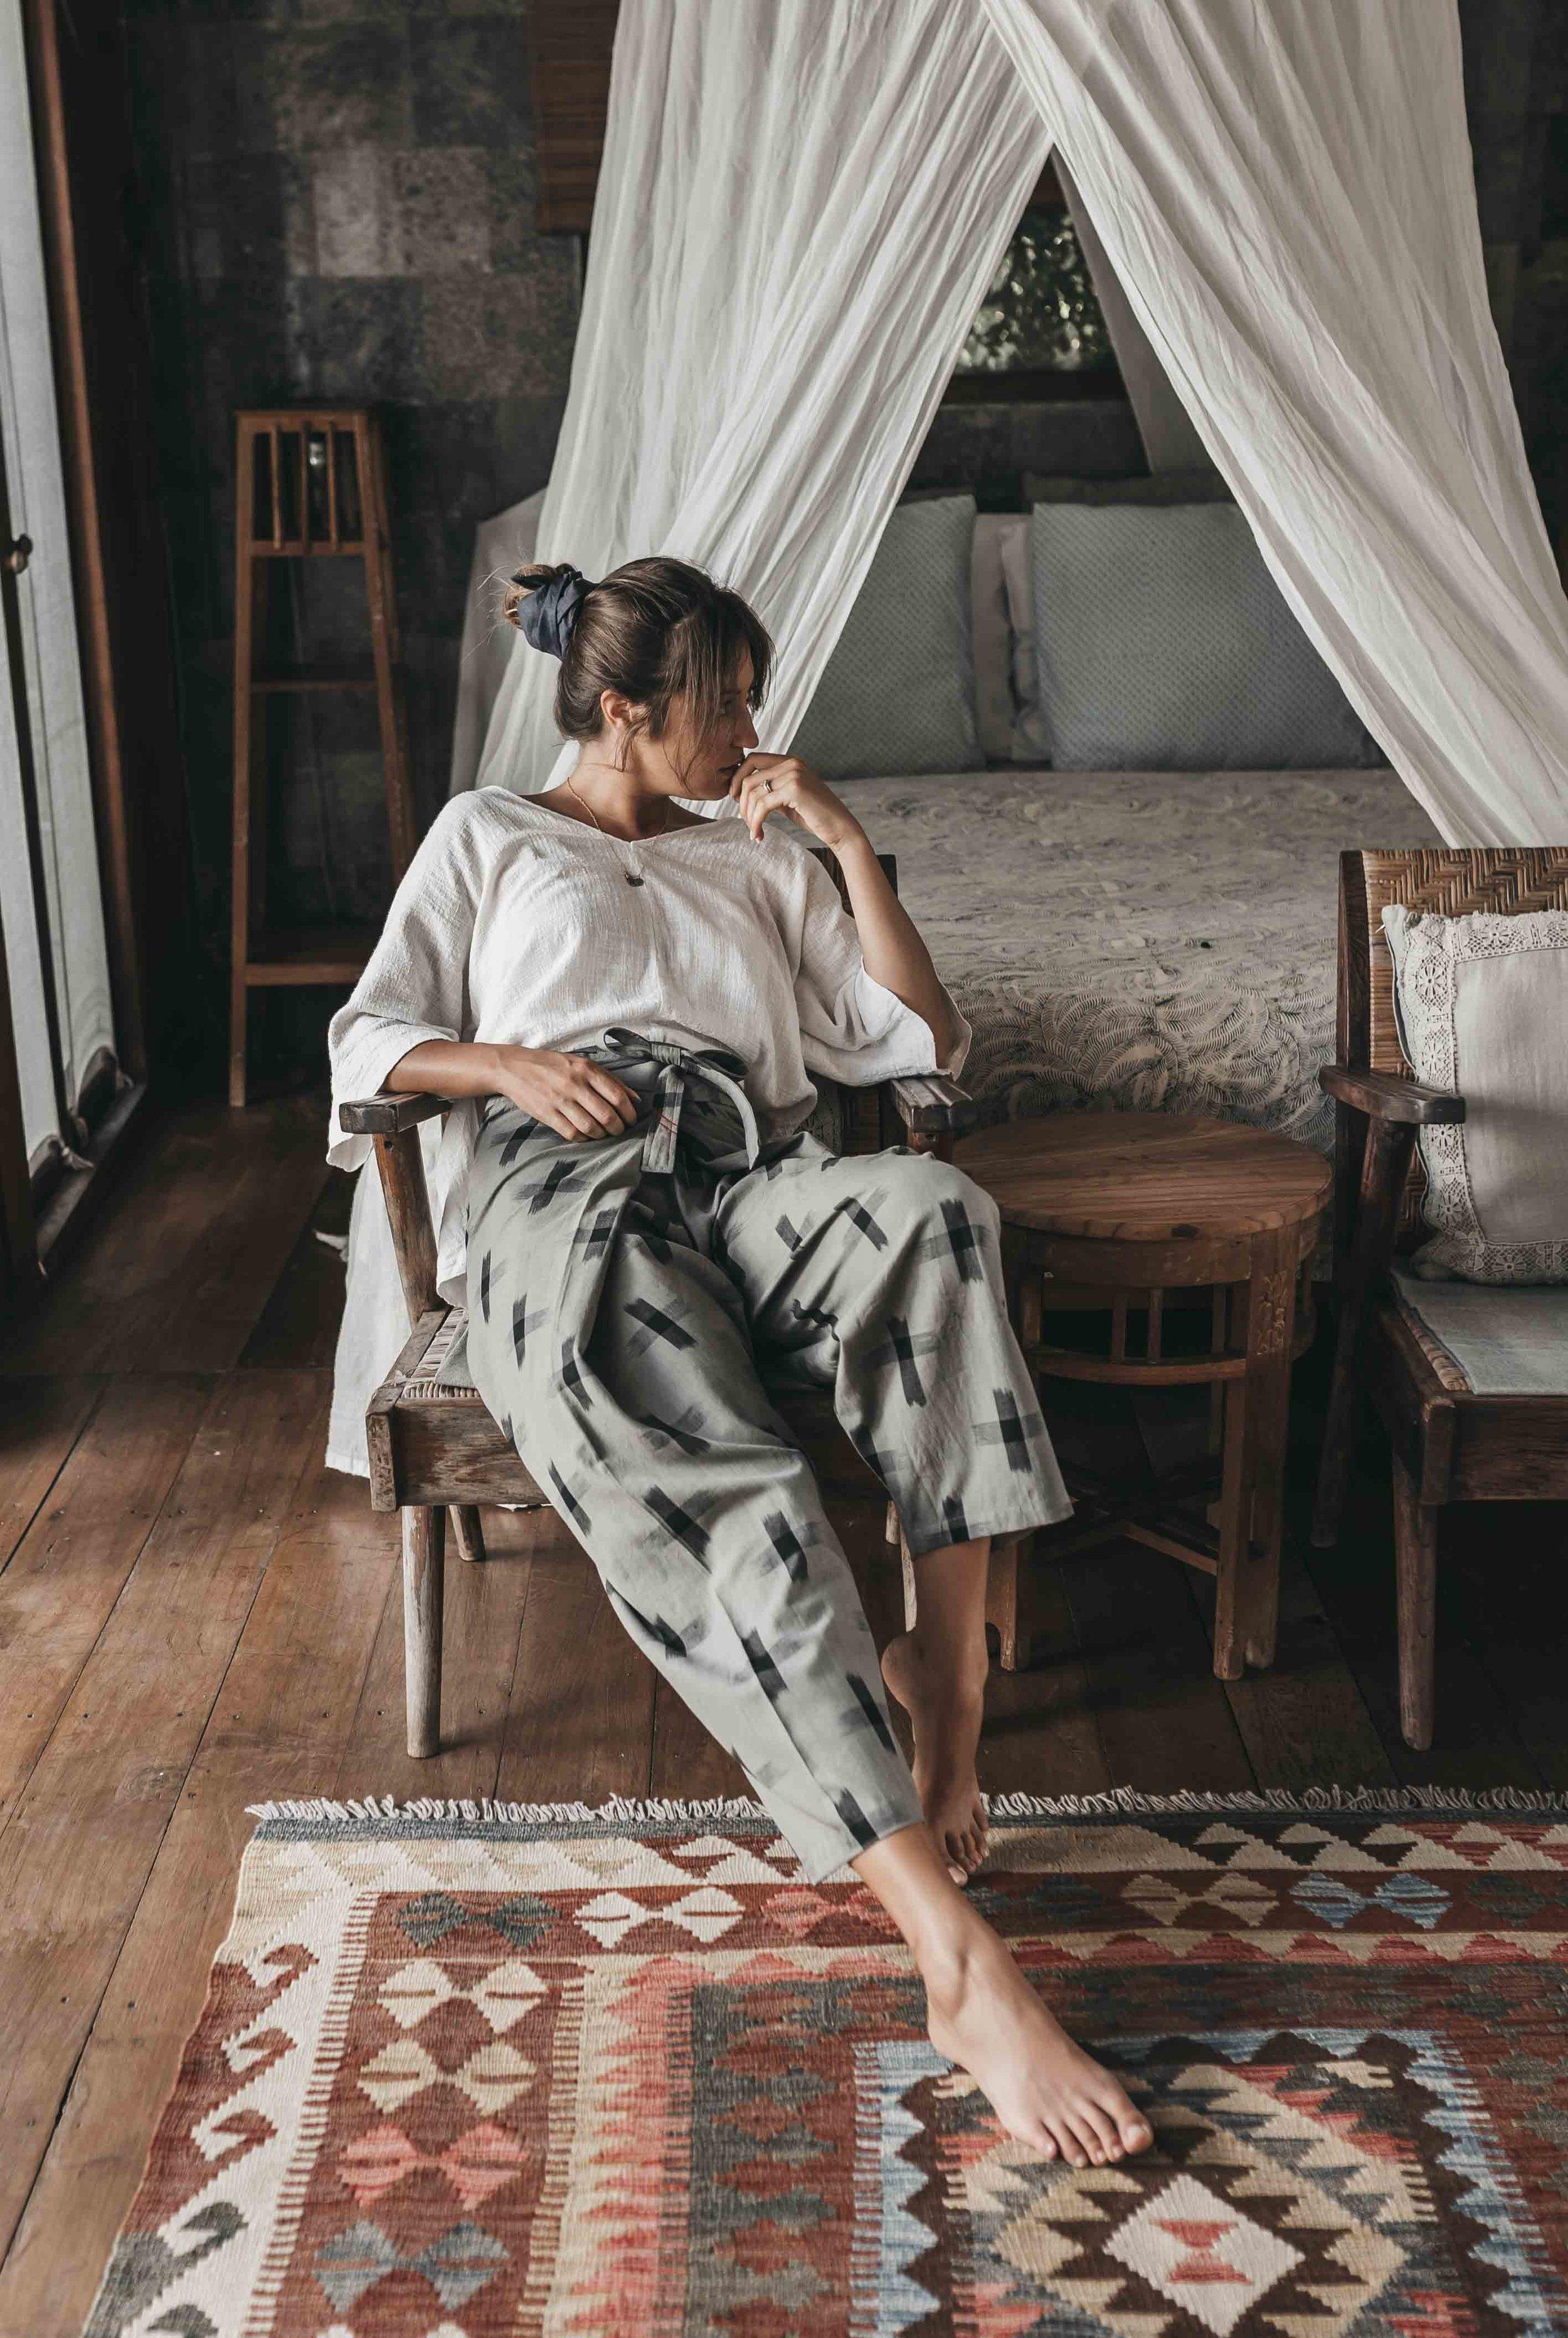 Keira-Mason-Matter-Prints-vintage-bedding.jpg